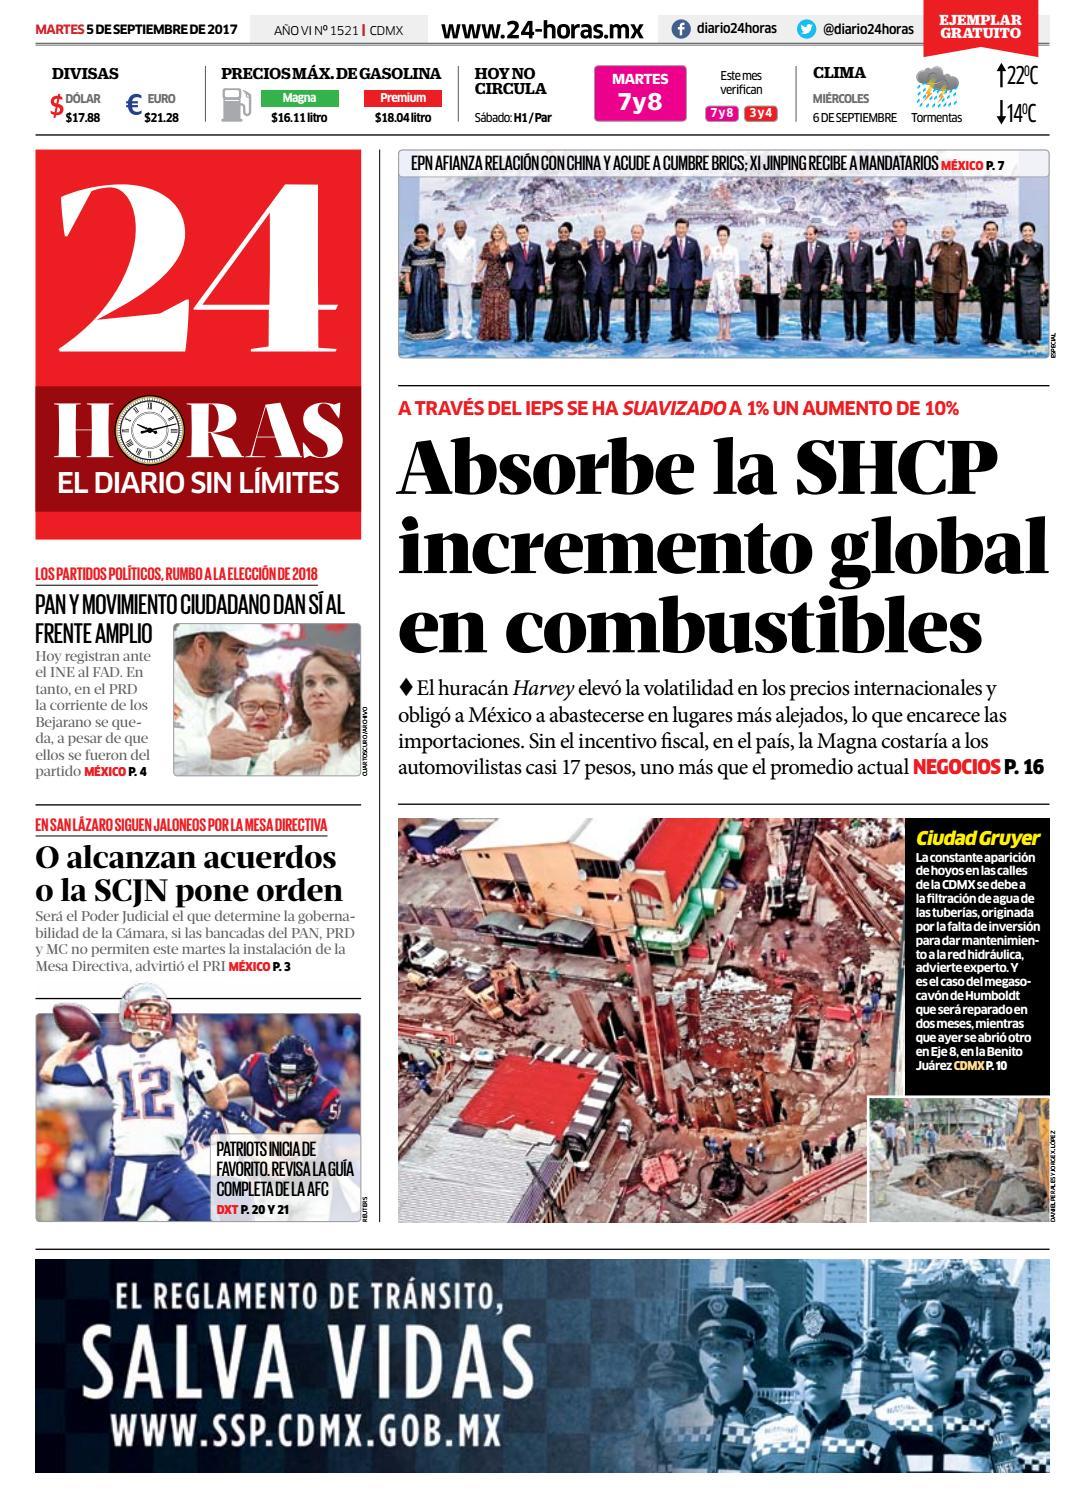 Septiembre   05   2017 by Información Integral 24/7 SAPI de C.V. - issuu